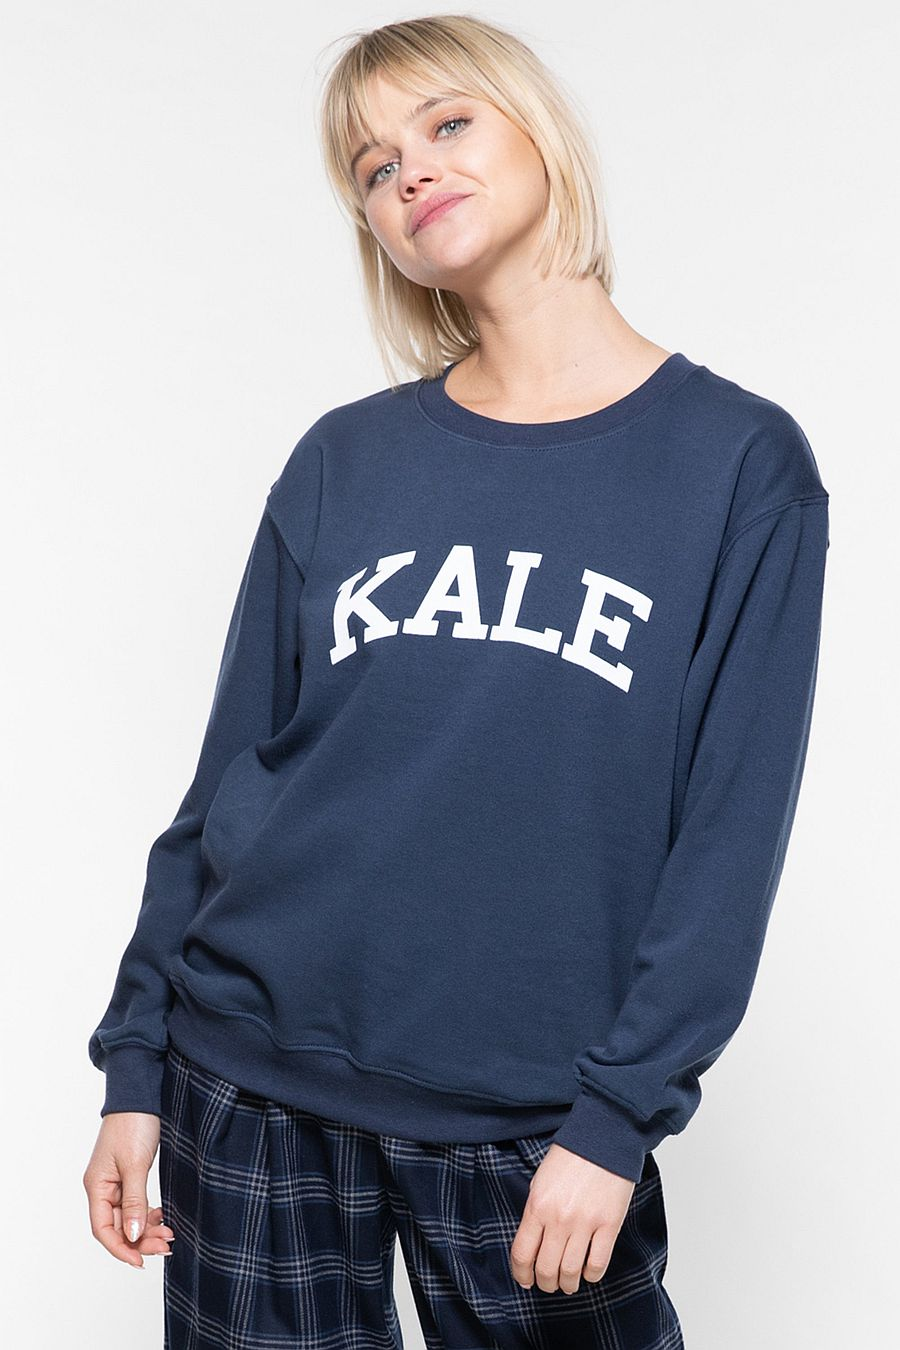 Sub_Urban Riot Kale Willow Sweatshirt - Navy